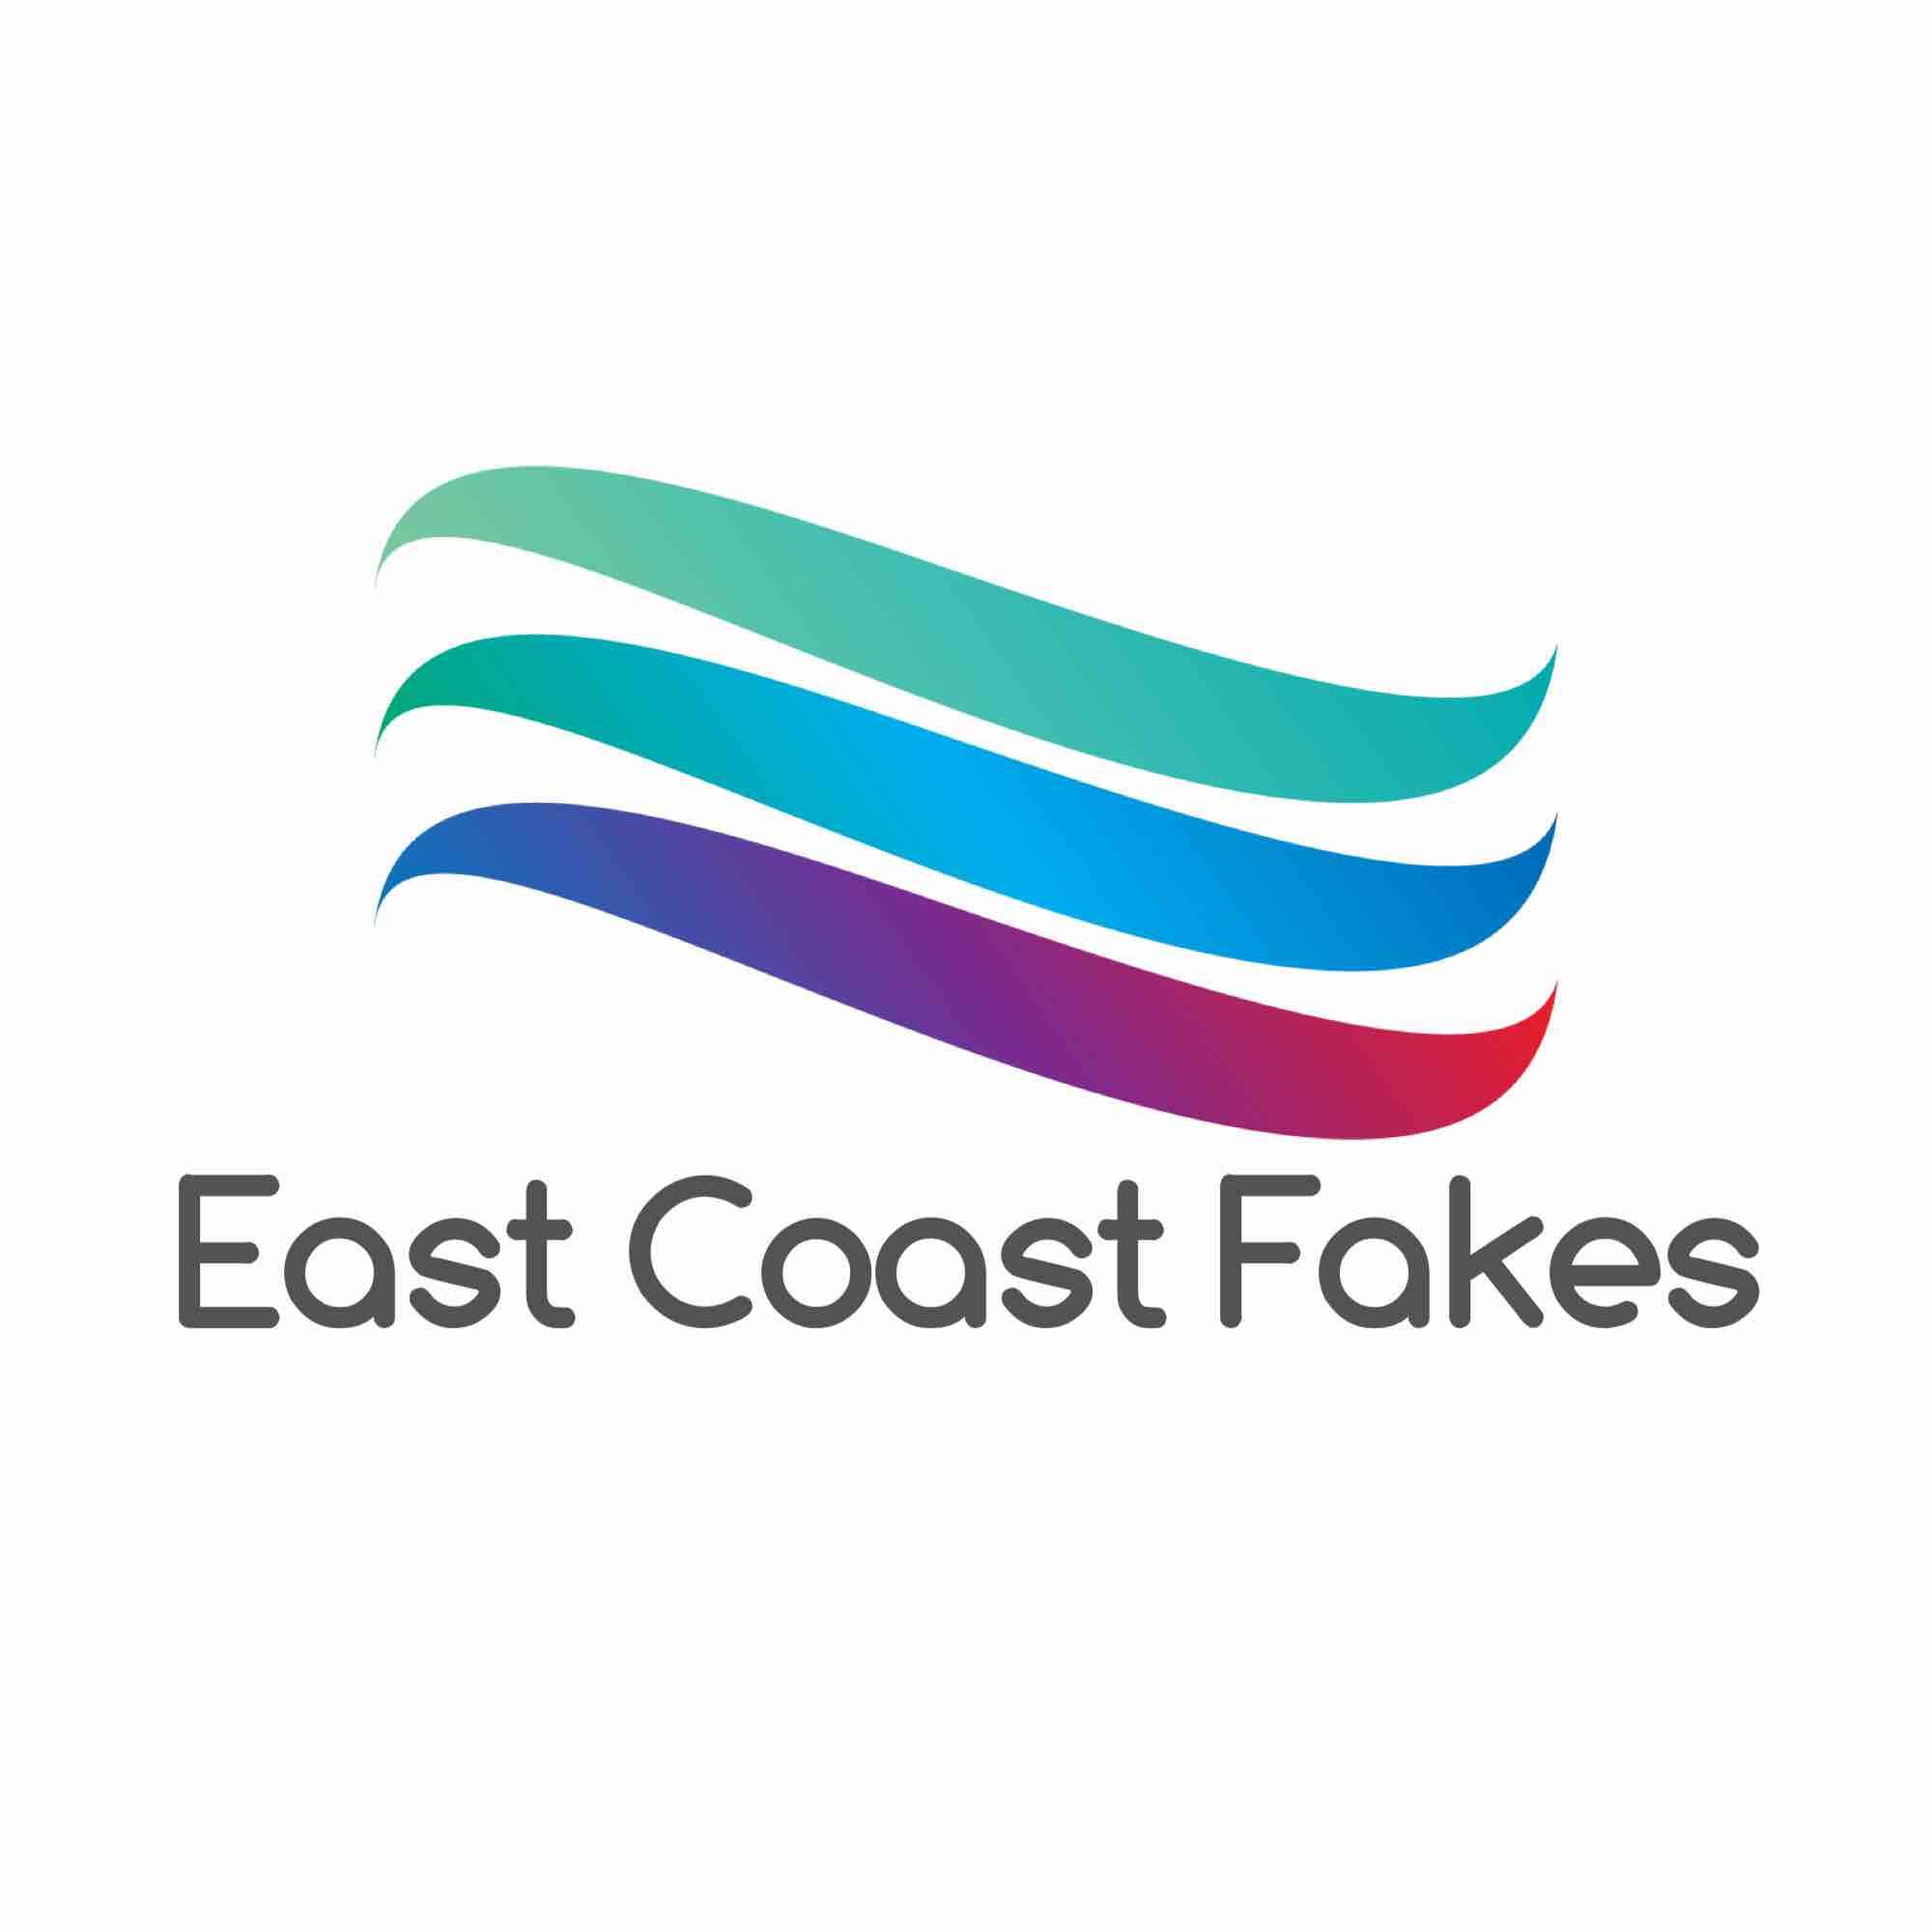 East Coast Fakes